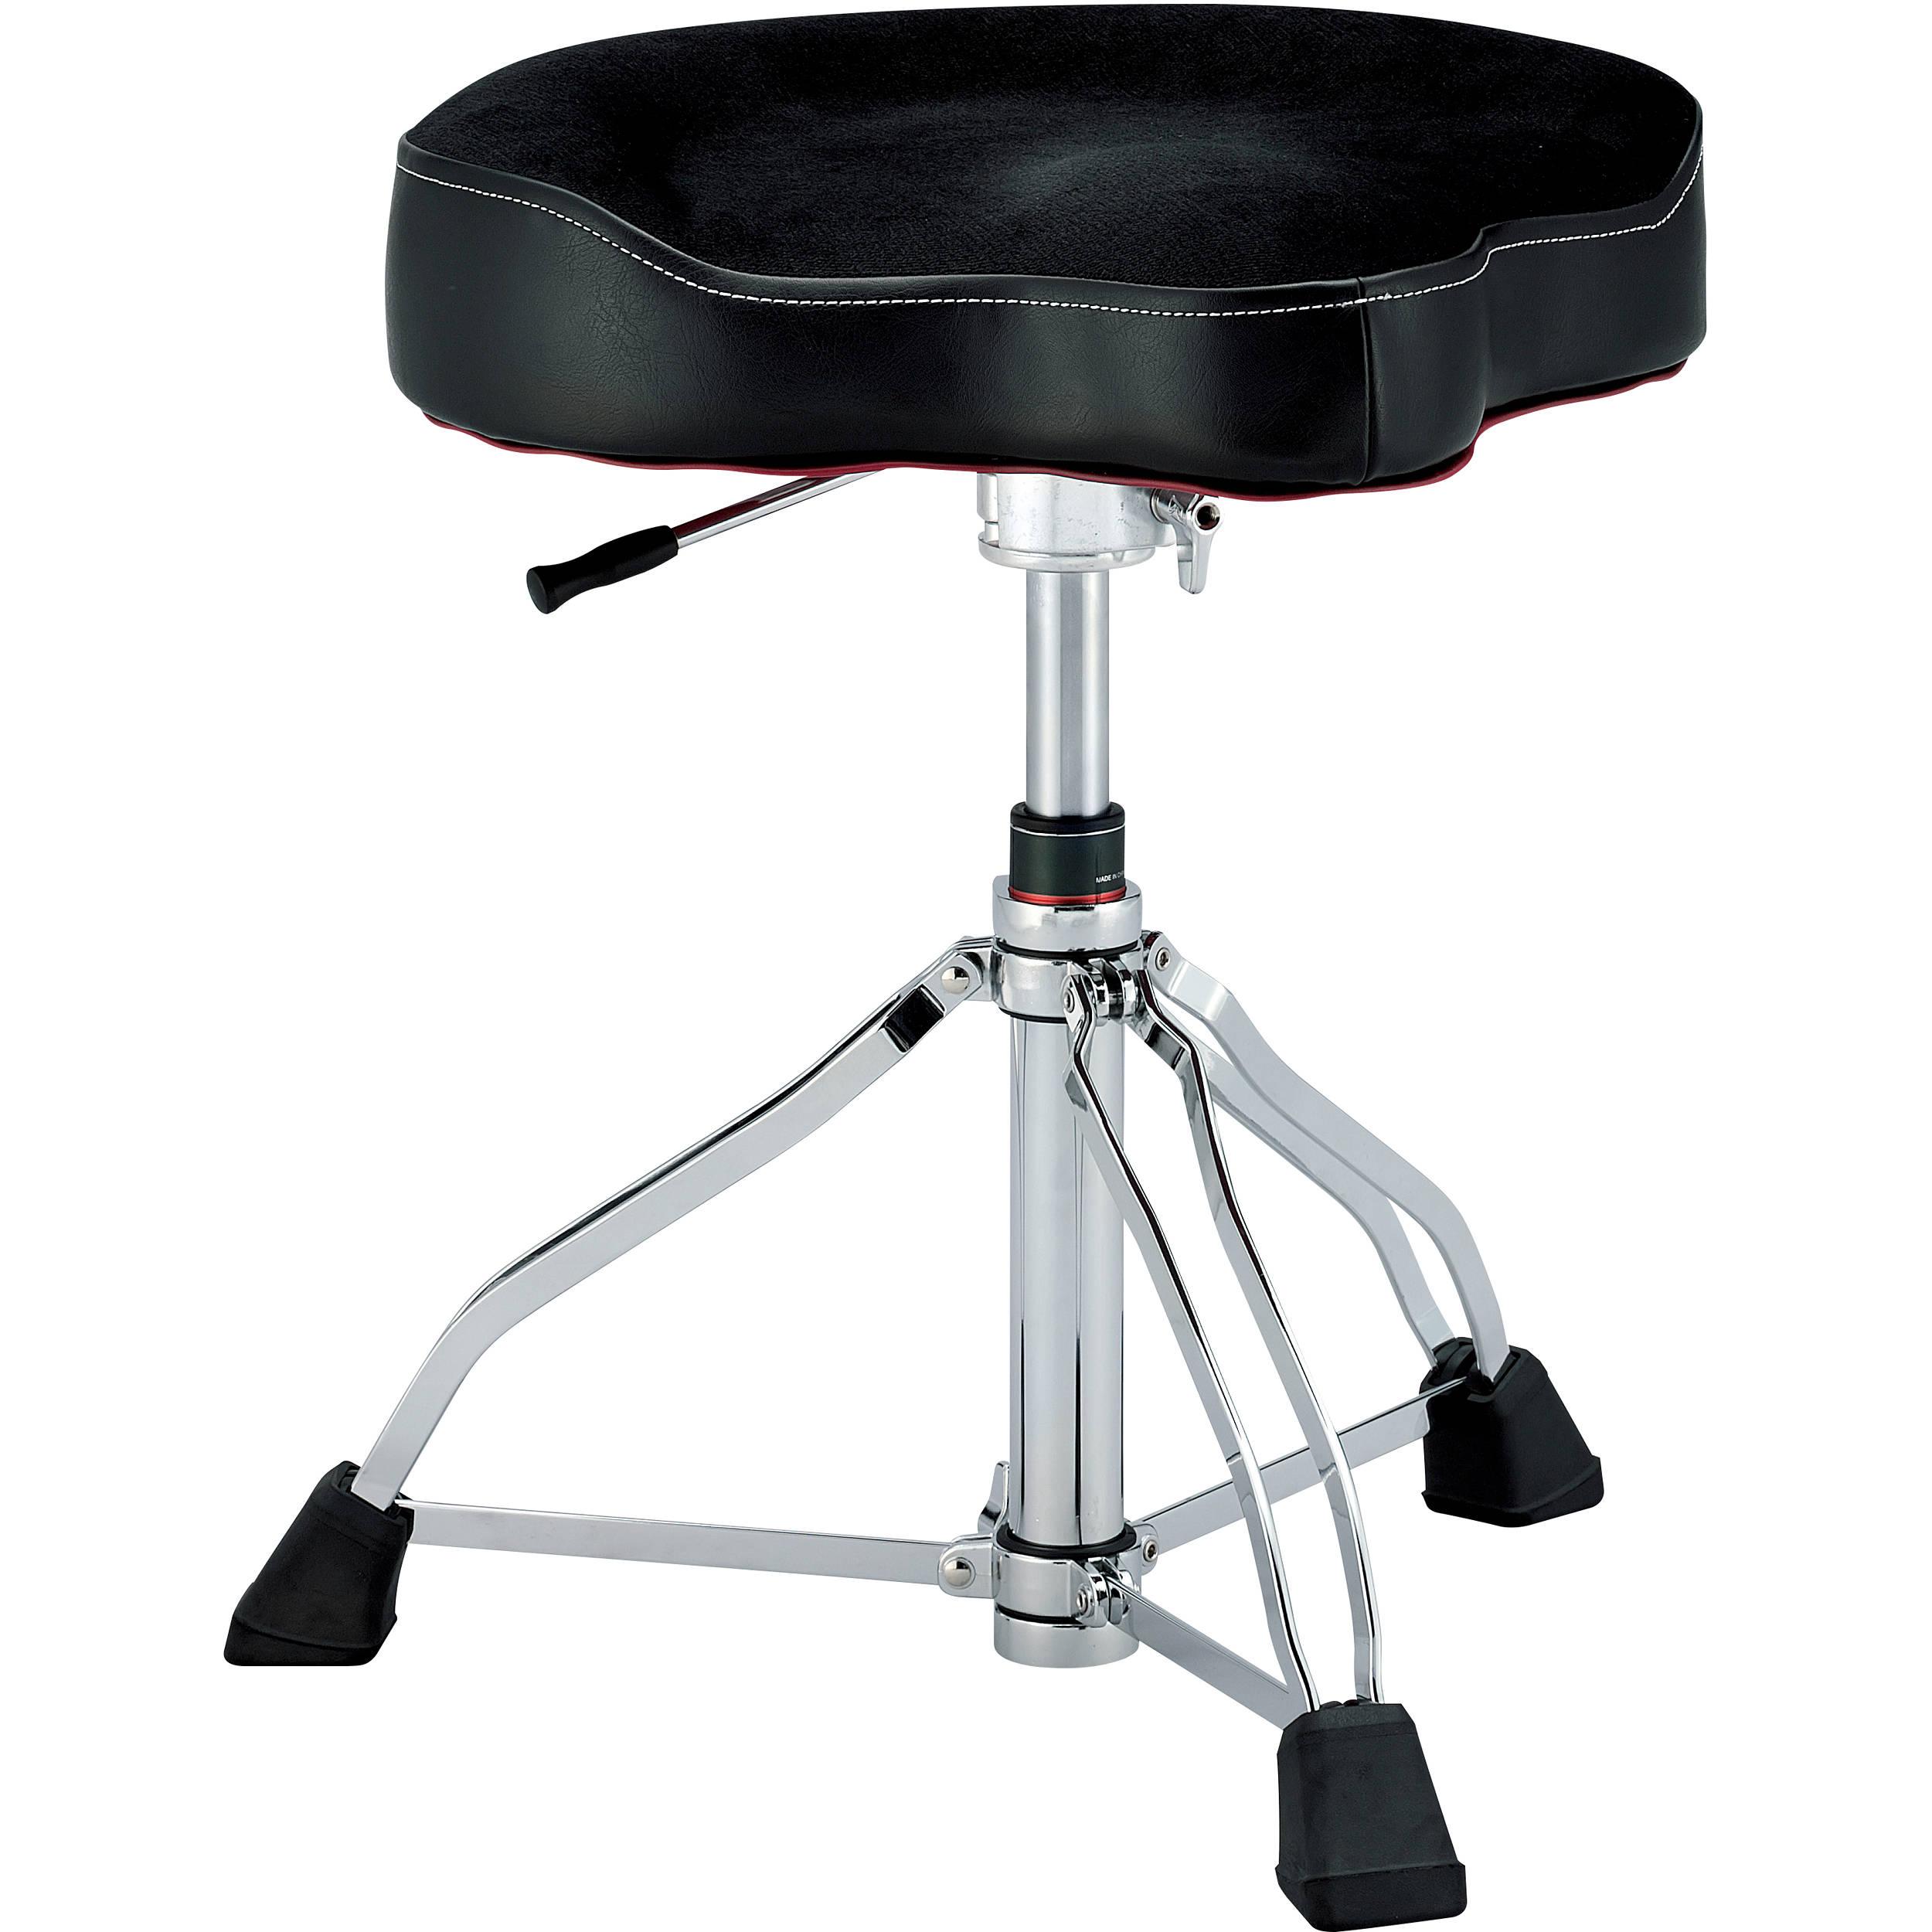 Prime S Bhphotovideo Com C Product 474233 Reg Ibusinesslaw Wood Chair Design Ideas Ibusinesslaworg